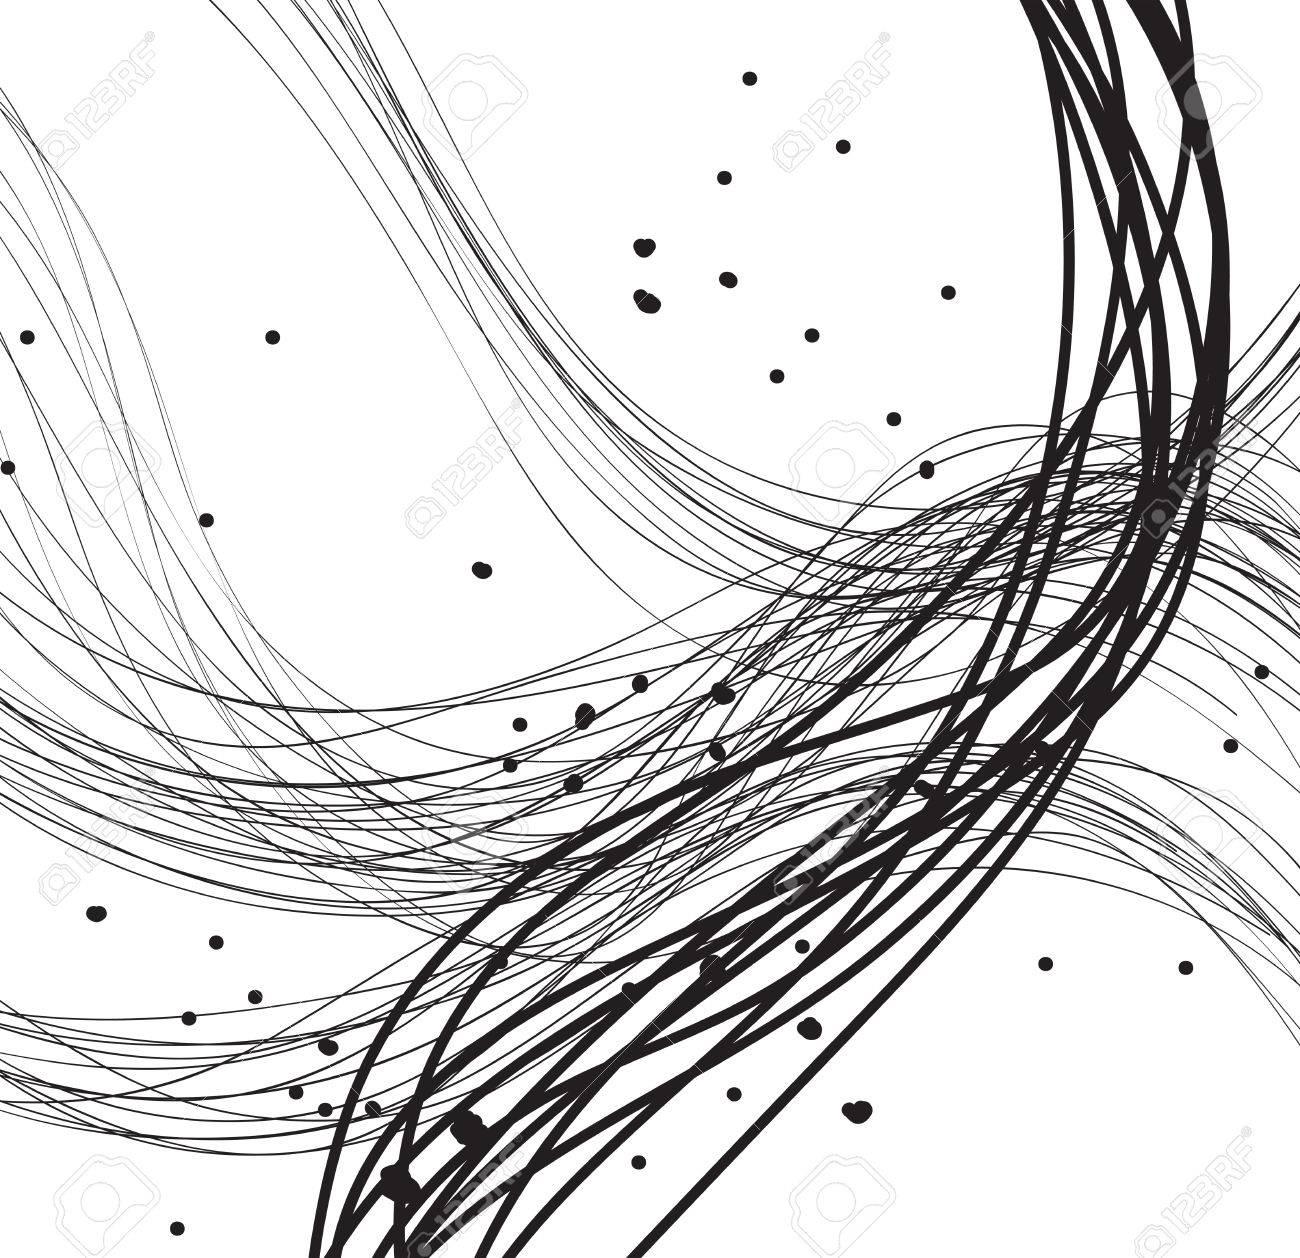 Abstract Linein Art